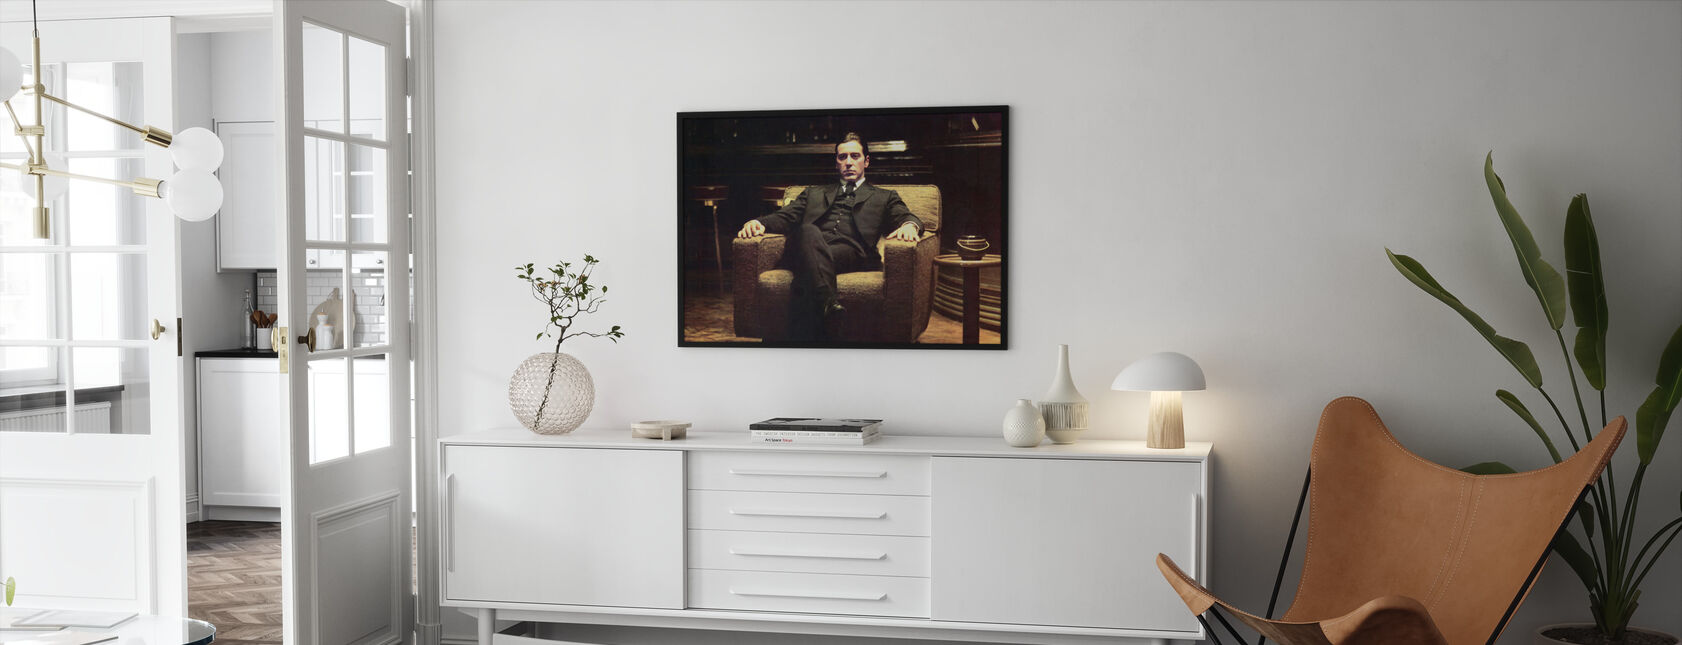 Gudfadern - lutade sig tillbaka Michael Corleone - Inramad tavla - Vardagsrum